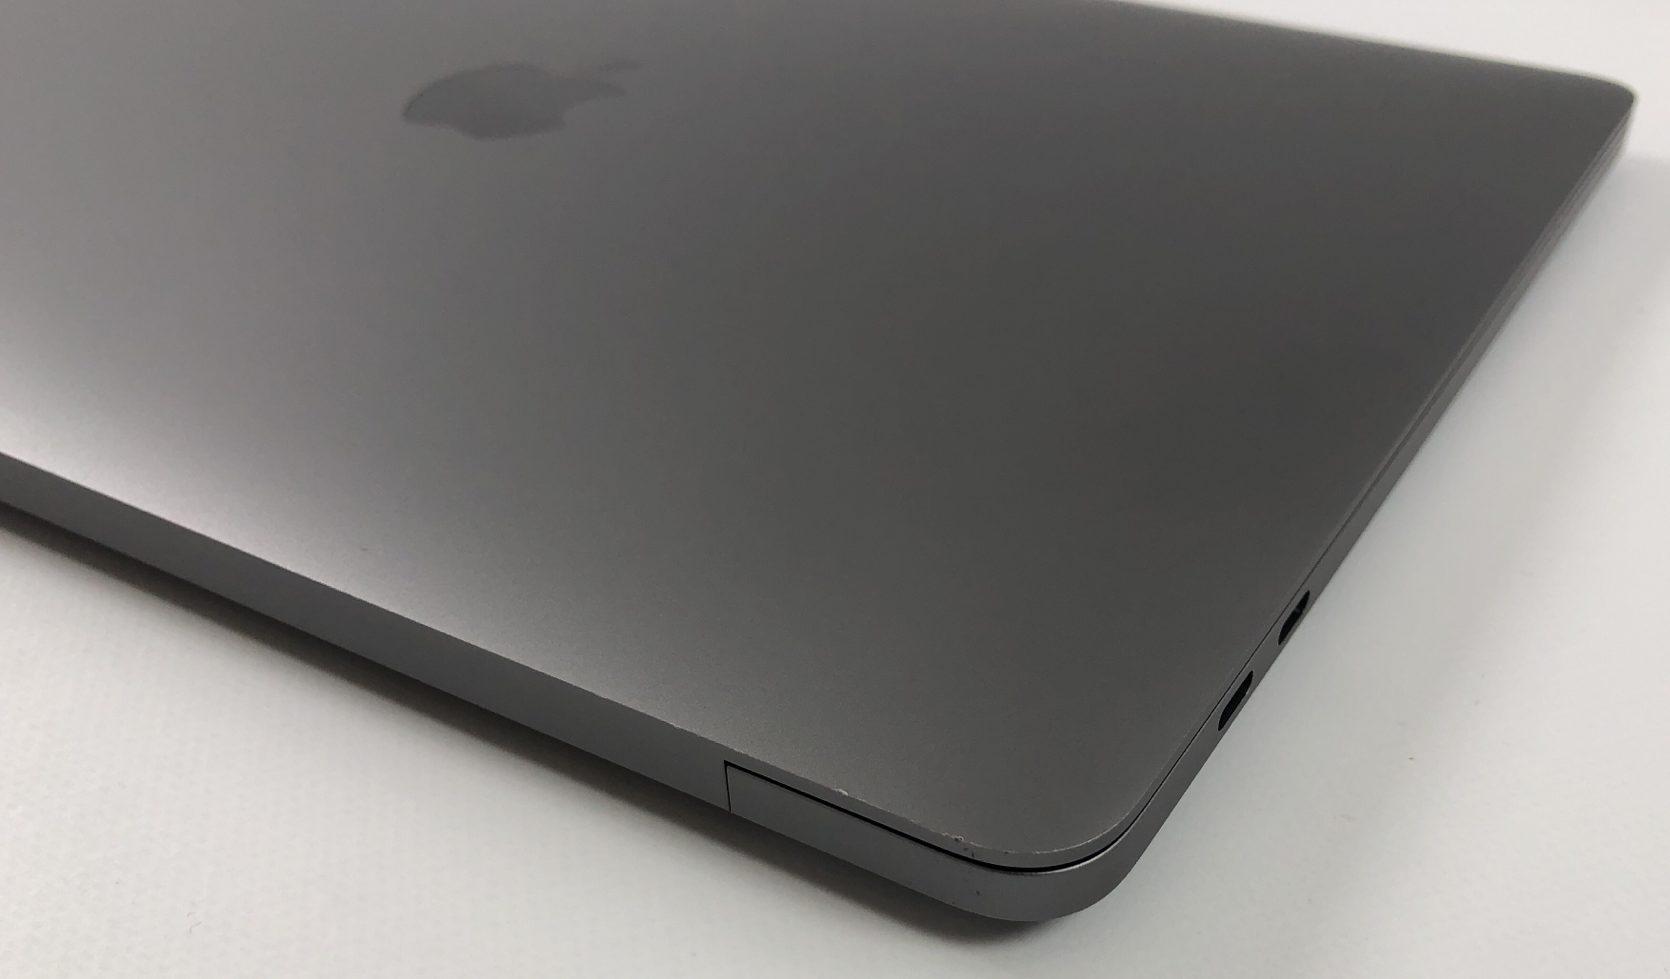 "MacBook Pro 13"" 4TBT Late 2016 (Intel Core i5 2.9 GHz 16 GB RAM 512 GB SSD), Space Gray, Intel Core i5 2.9 GHz, 16 GB RAM, 512 GB SSD, Afbeelding 3"